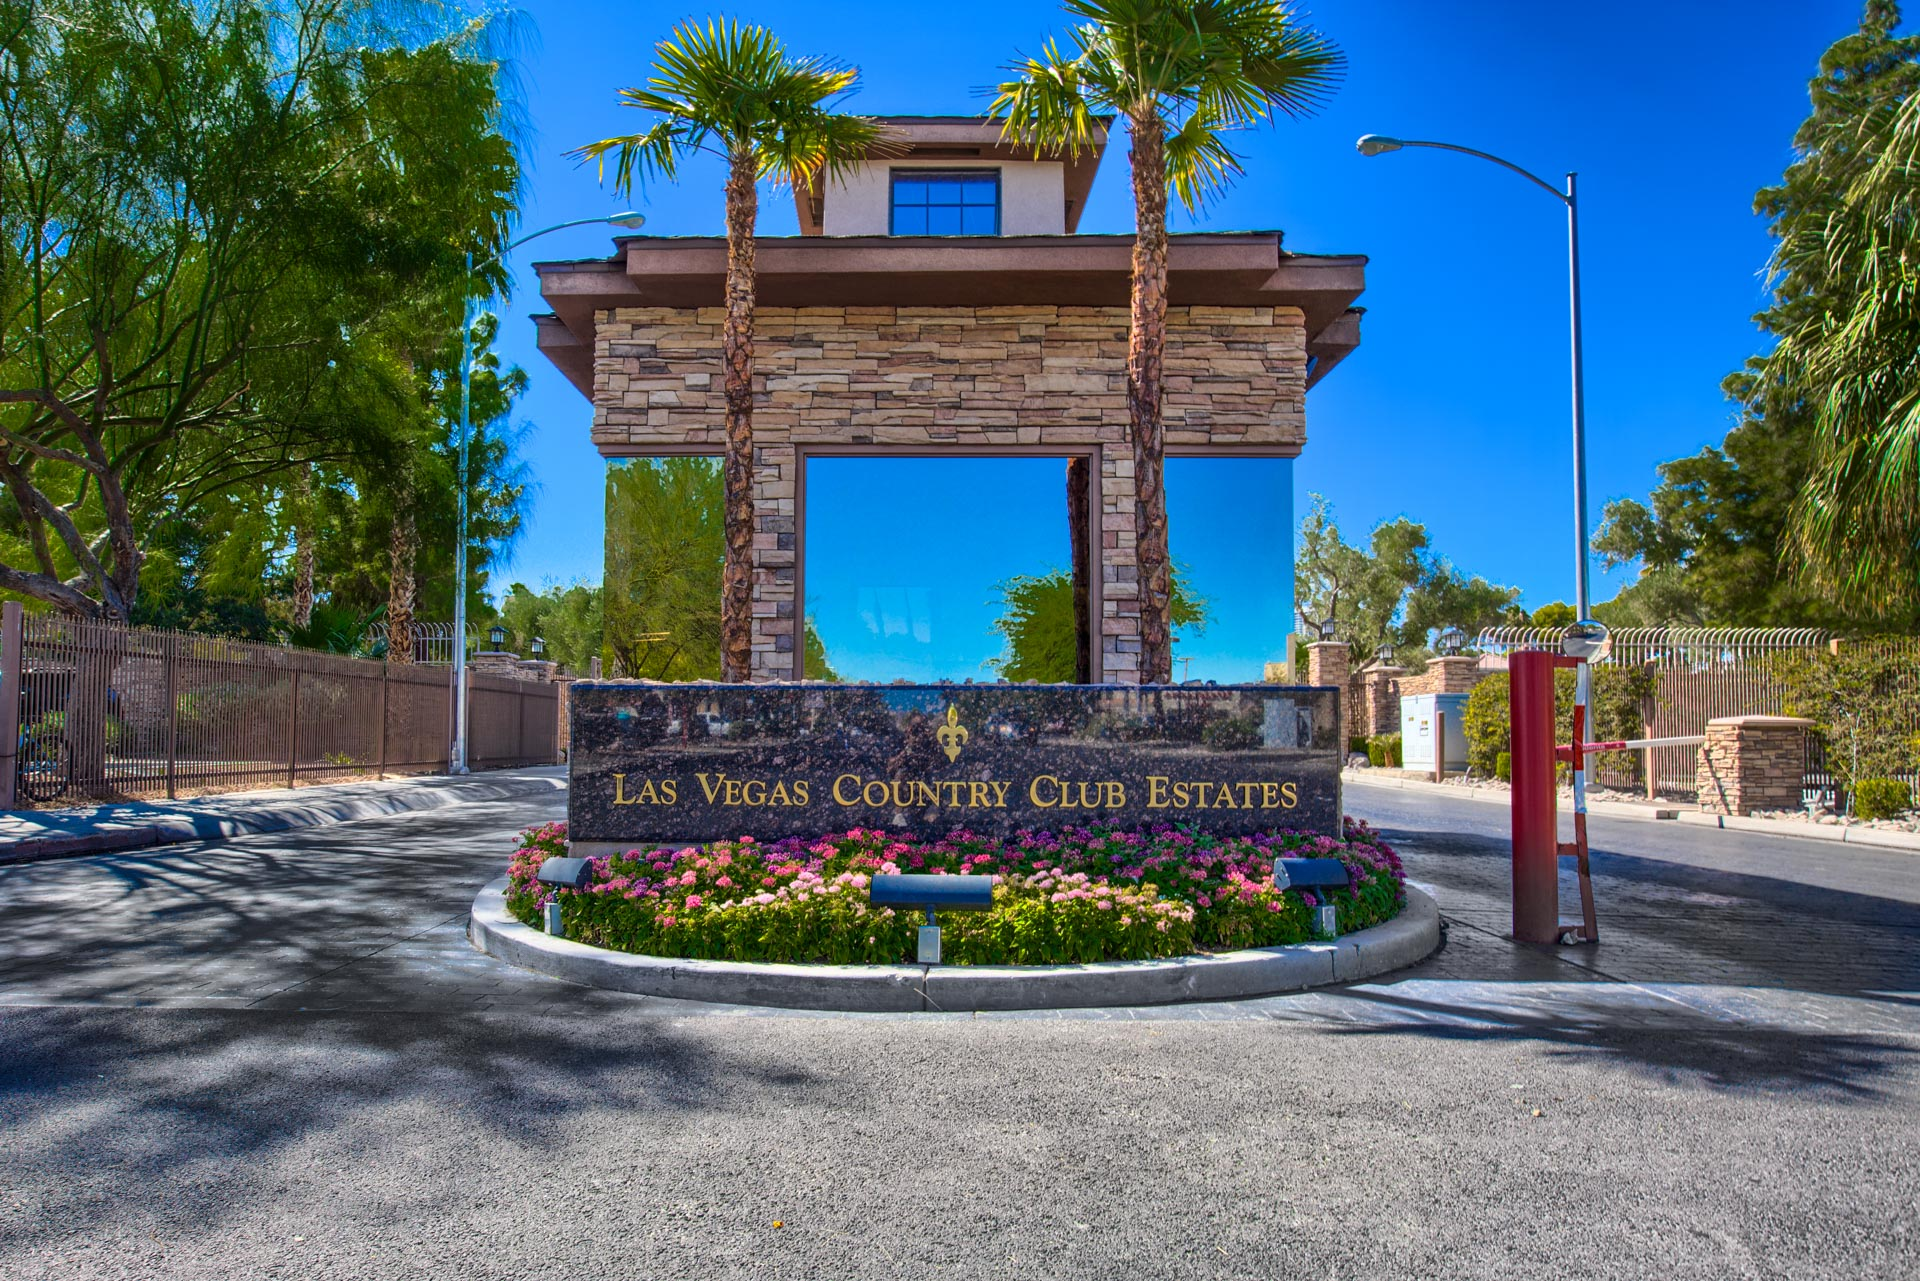 Las Vegas Country Club Homes For Sale